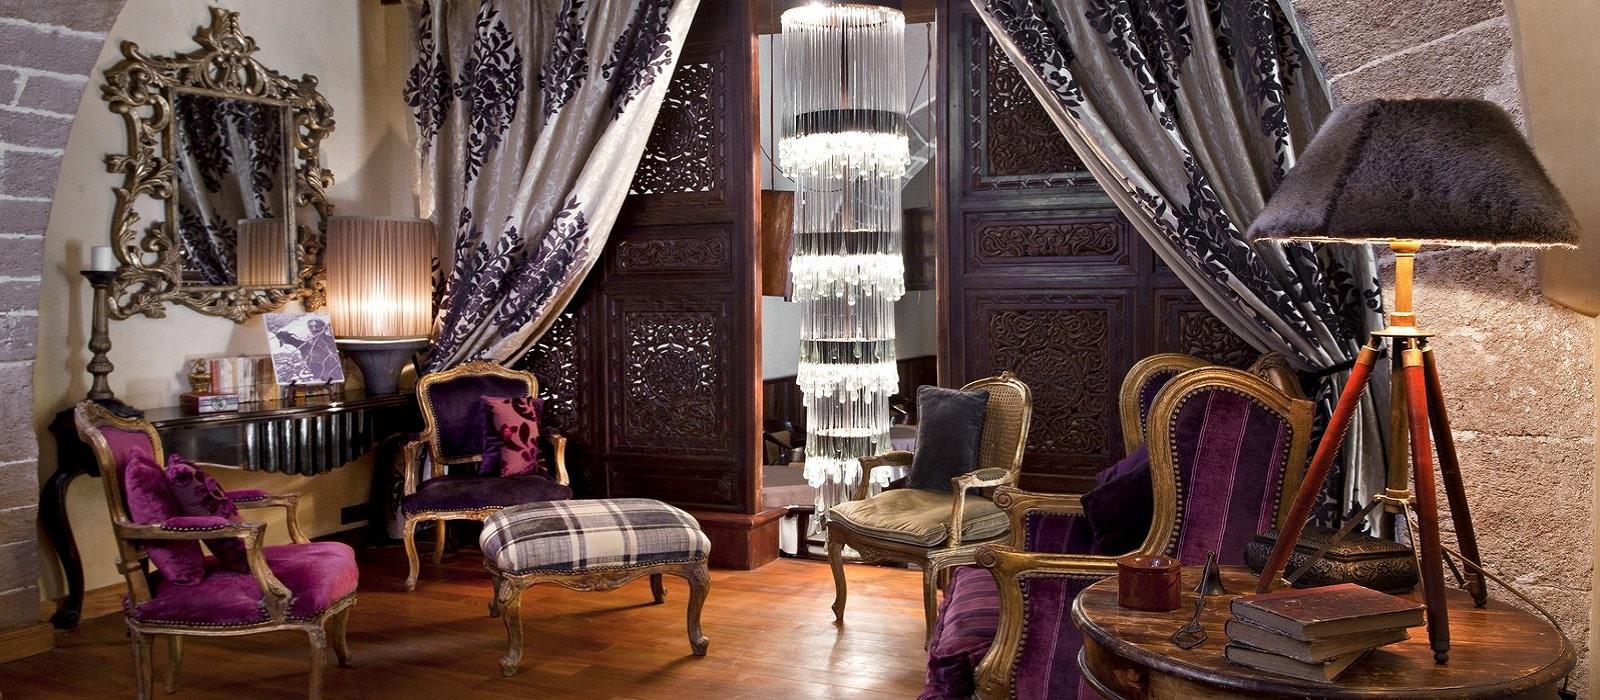 Hotel Villa de l'Ô Morocco